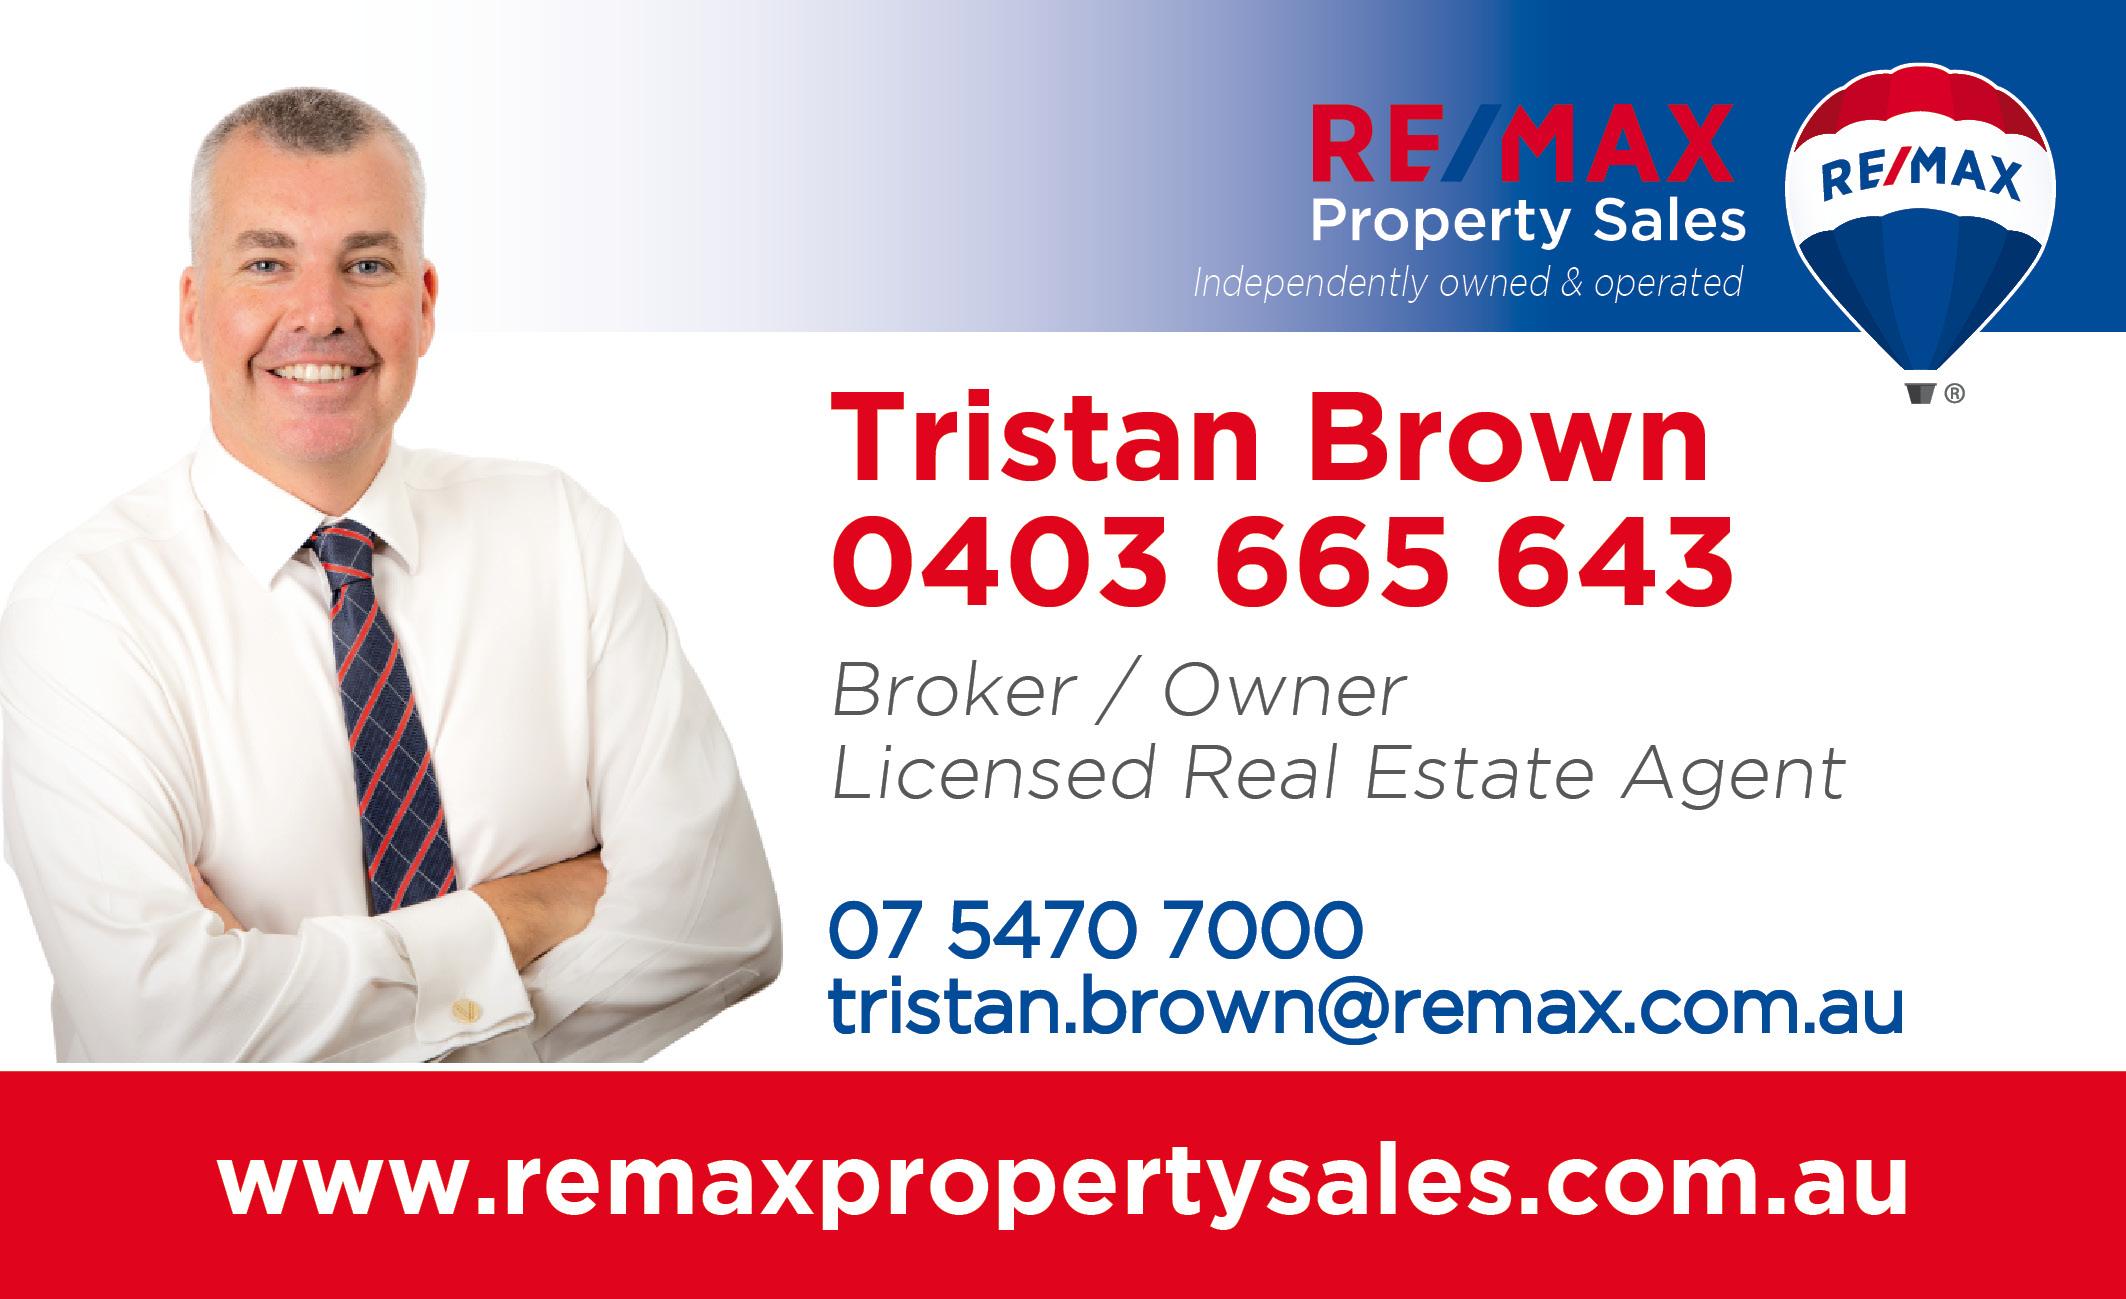 Tristan Brown REMAX